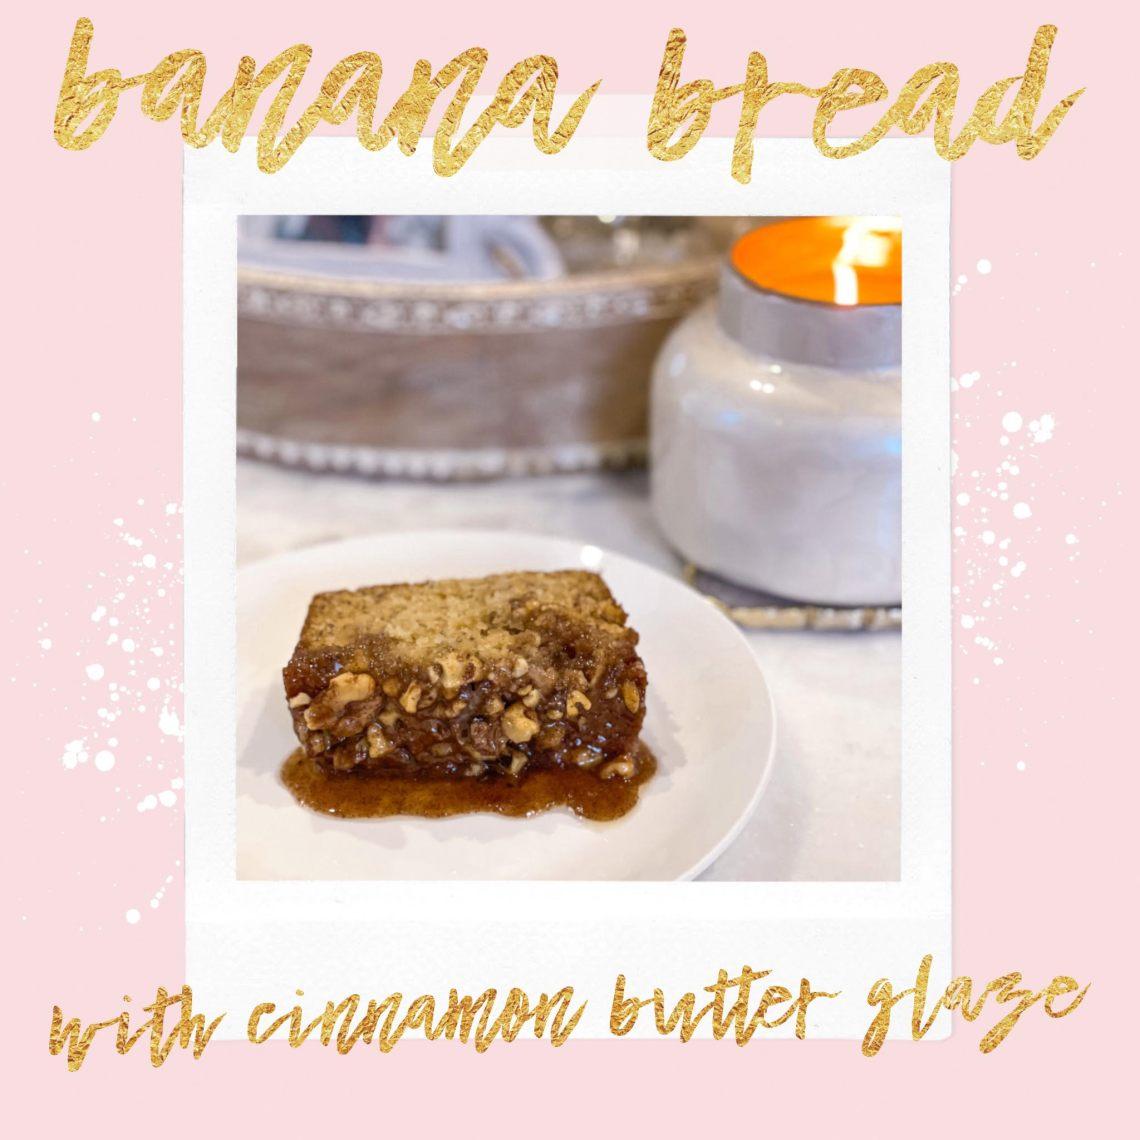 unnamed - Banana Bread With Cinnamon Butter Glaze